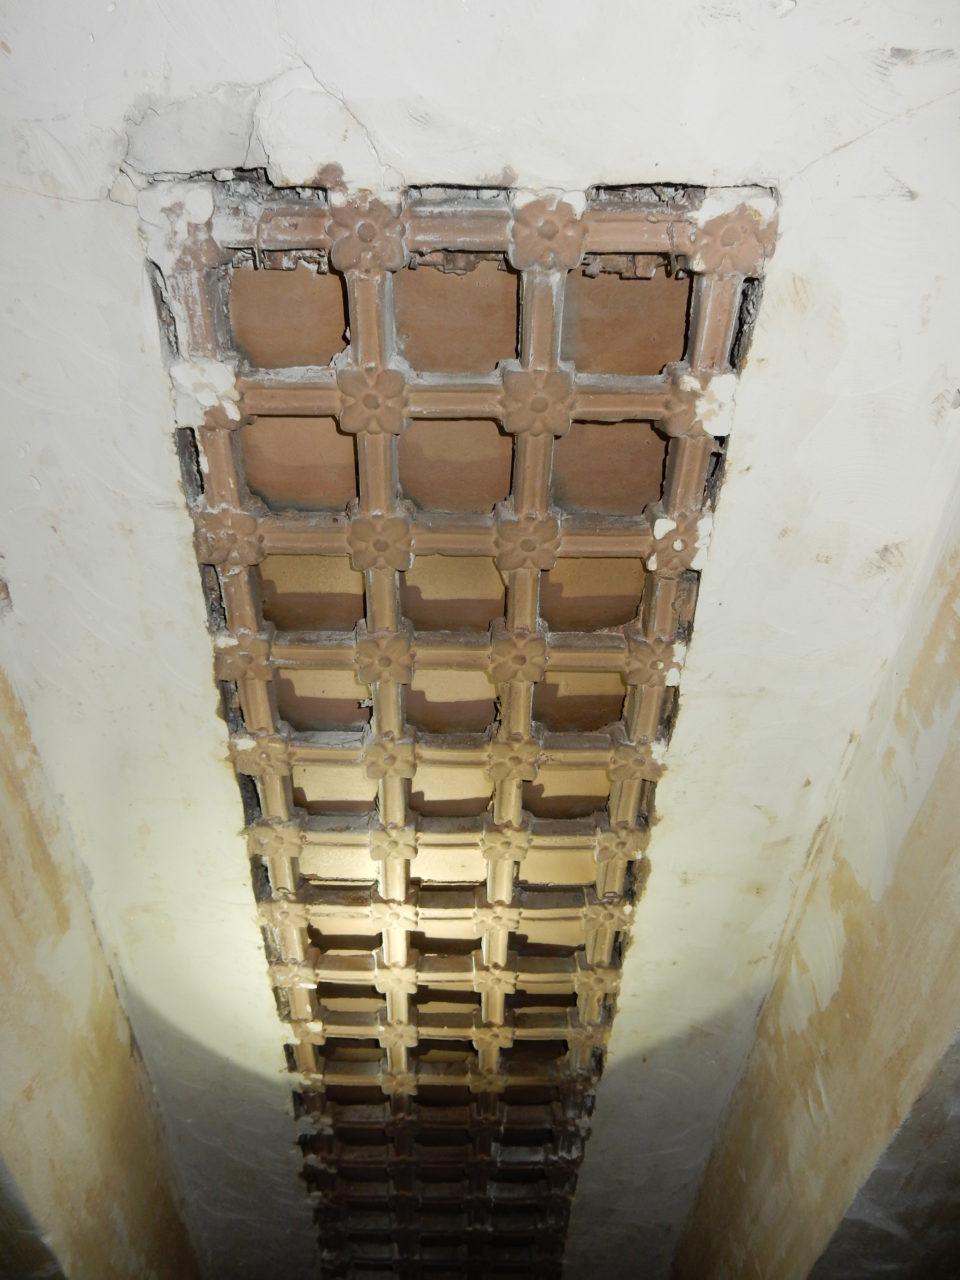 Ceiling HVAC grate